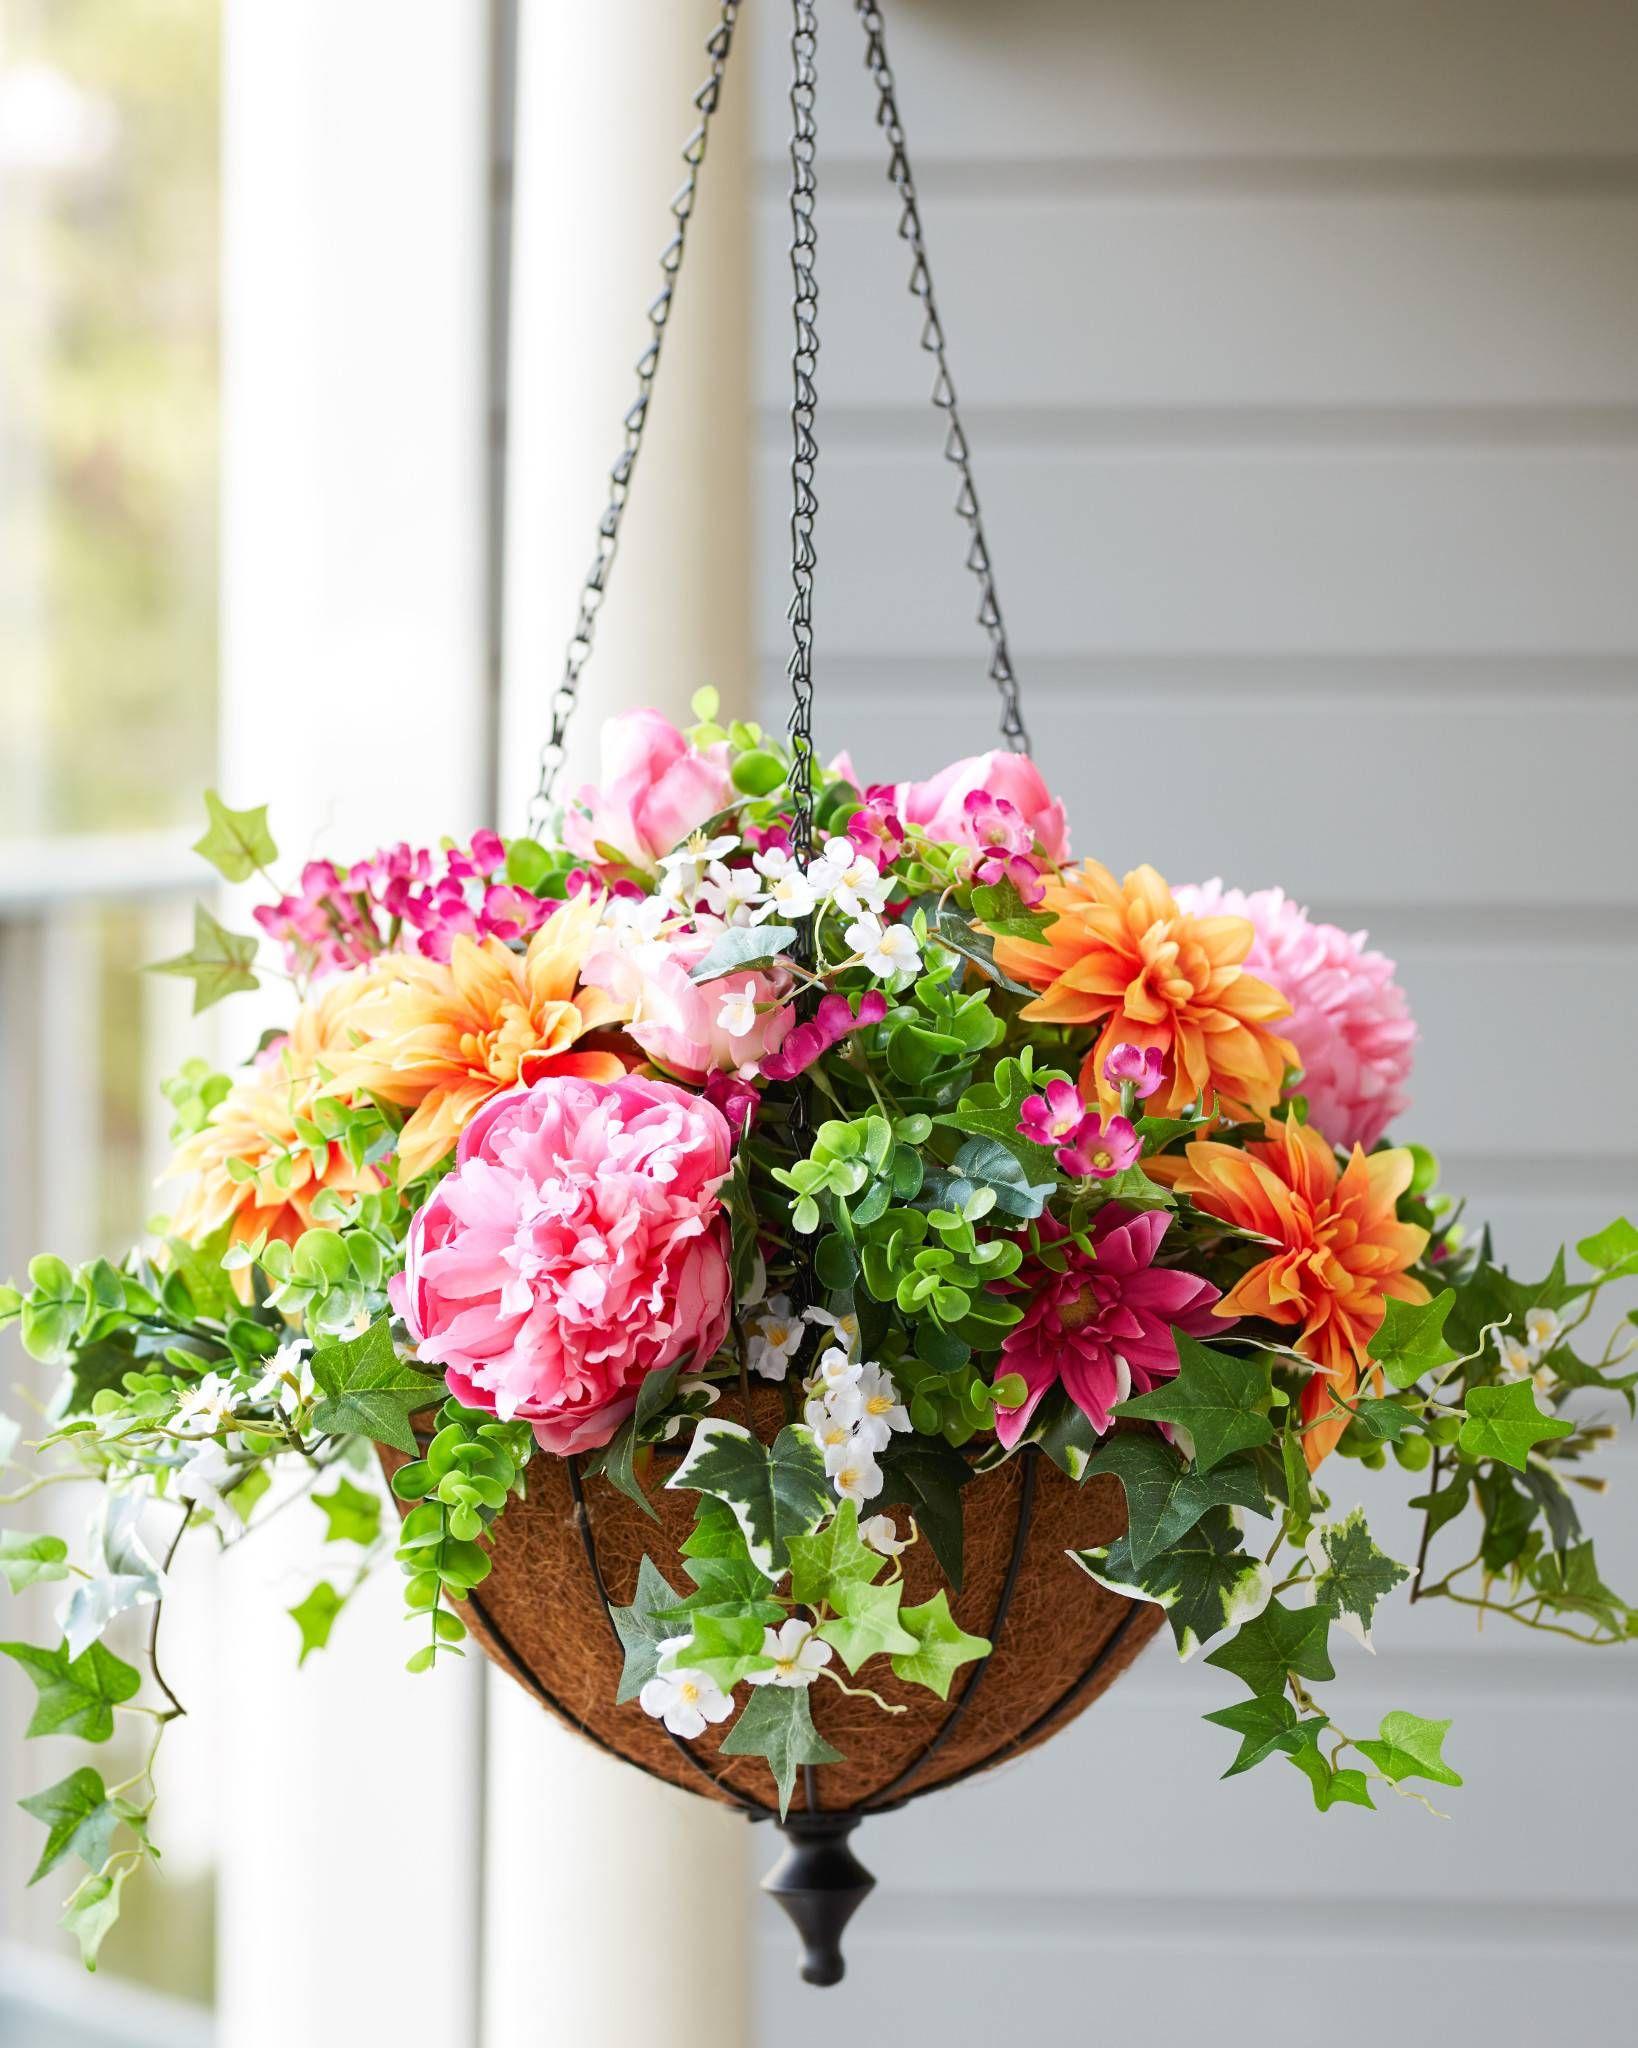 Outdoor Radiant Peony Artificial Flower Wreaths Balsam Hill Hanging Plants Indoor Hanging Plants Artificial Hanging Plants